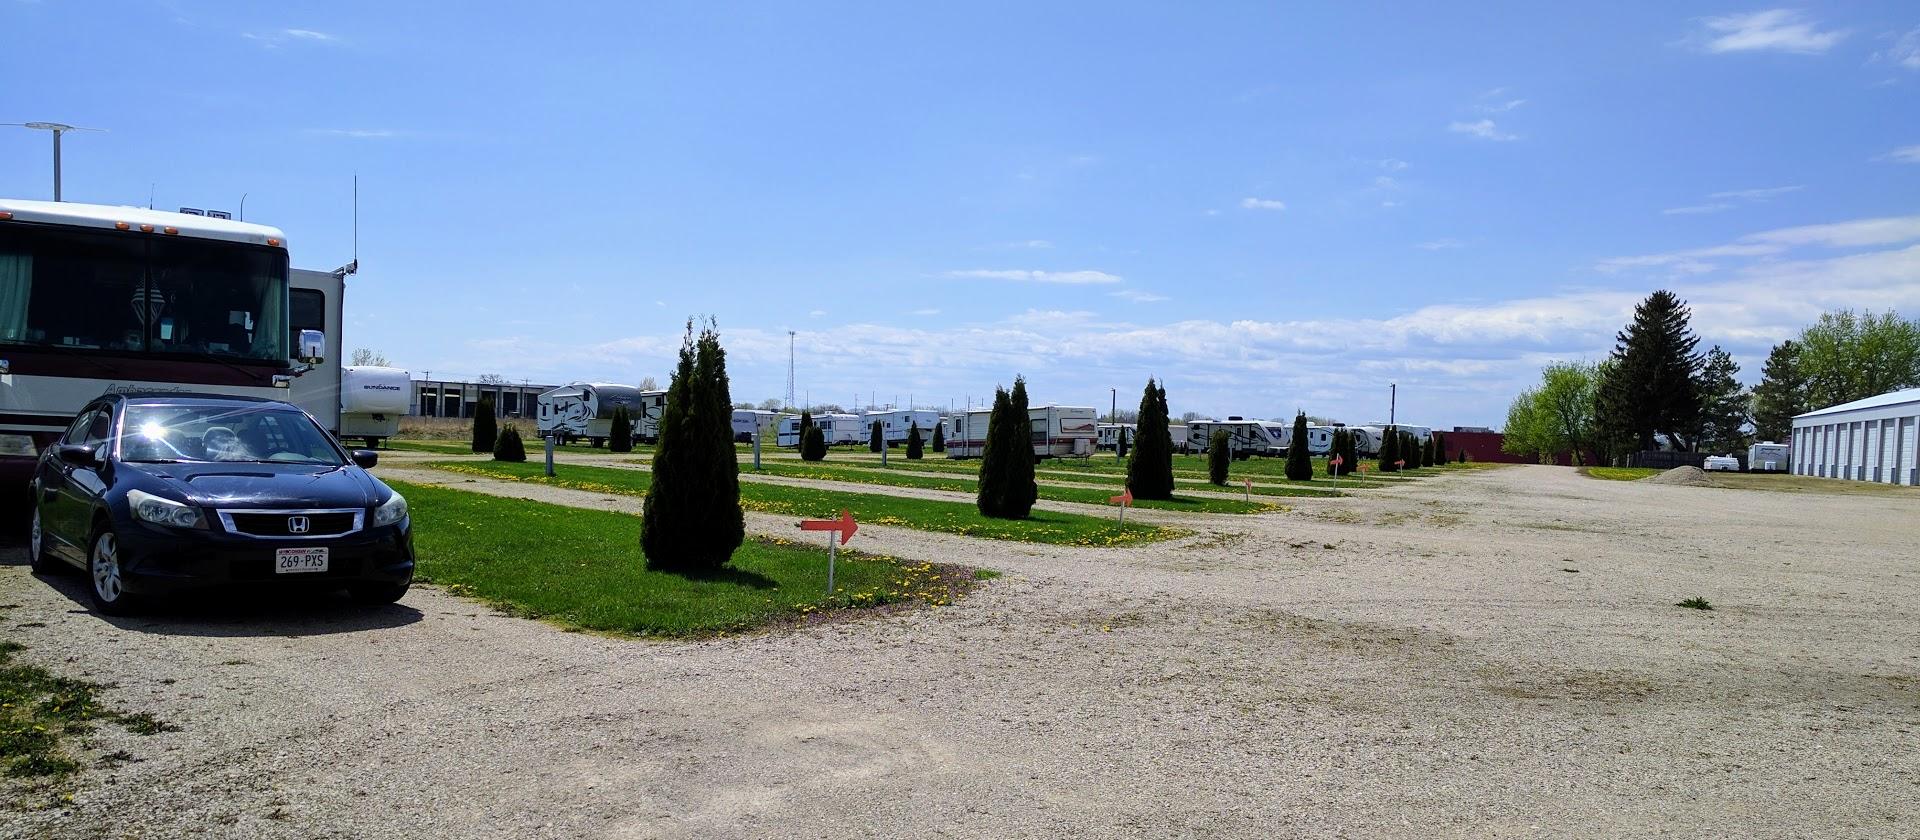 Omro RV Park in May 2017.